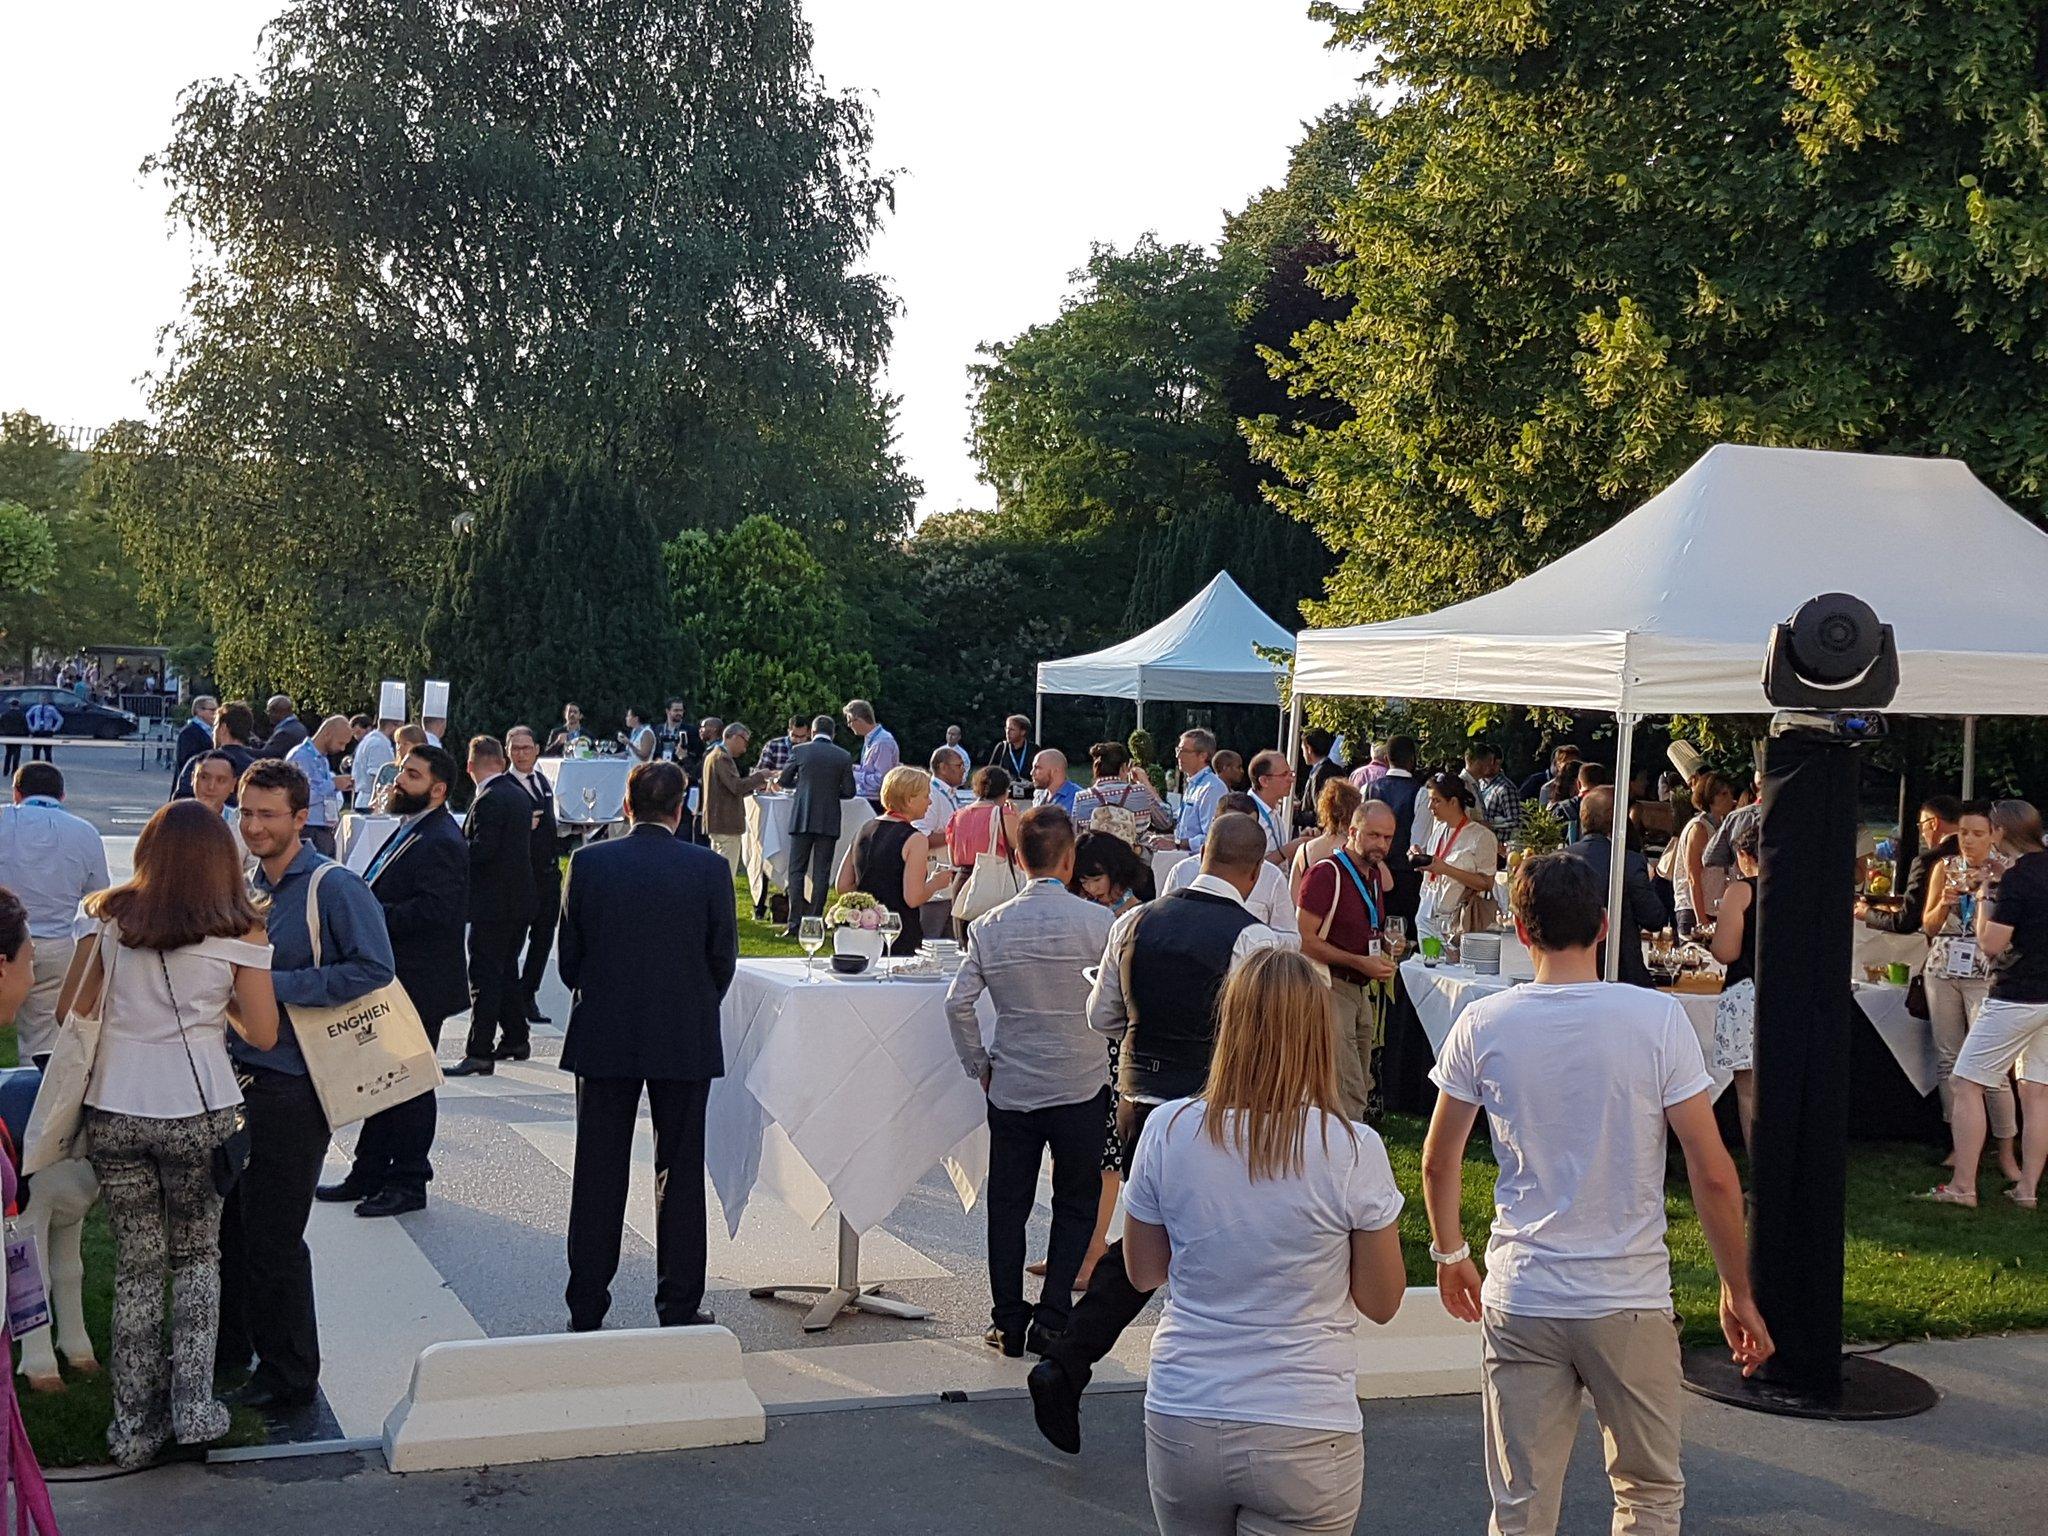 Cocktail & networking time at #EBNCONGRESS 🍸 #innovation #ecosystems @EUBIC https://t.co/V2RgdAkTEJ